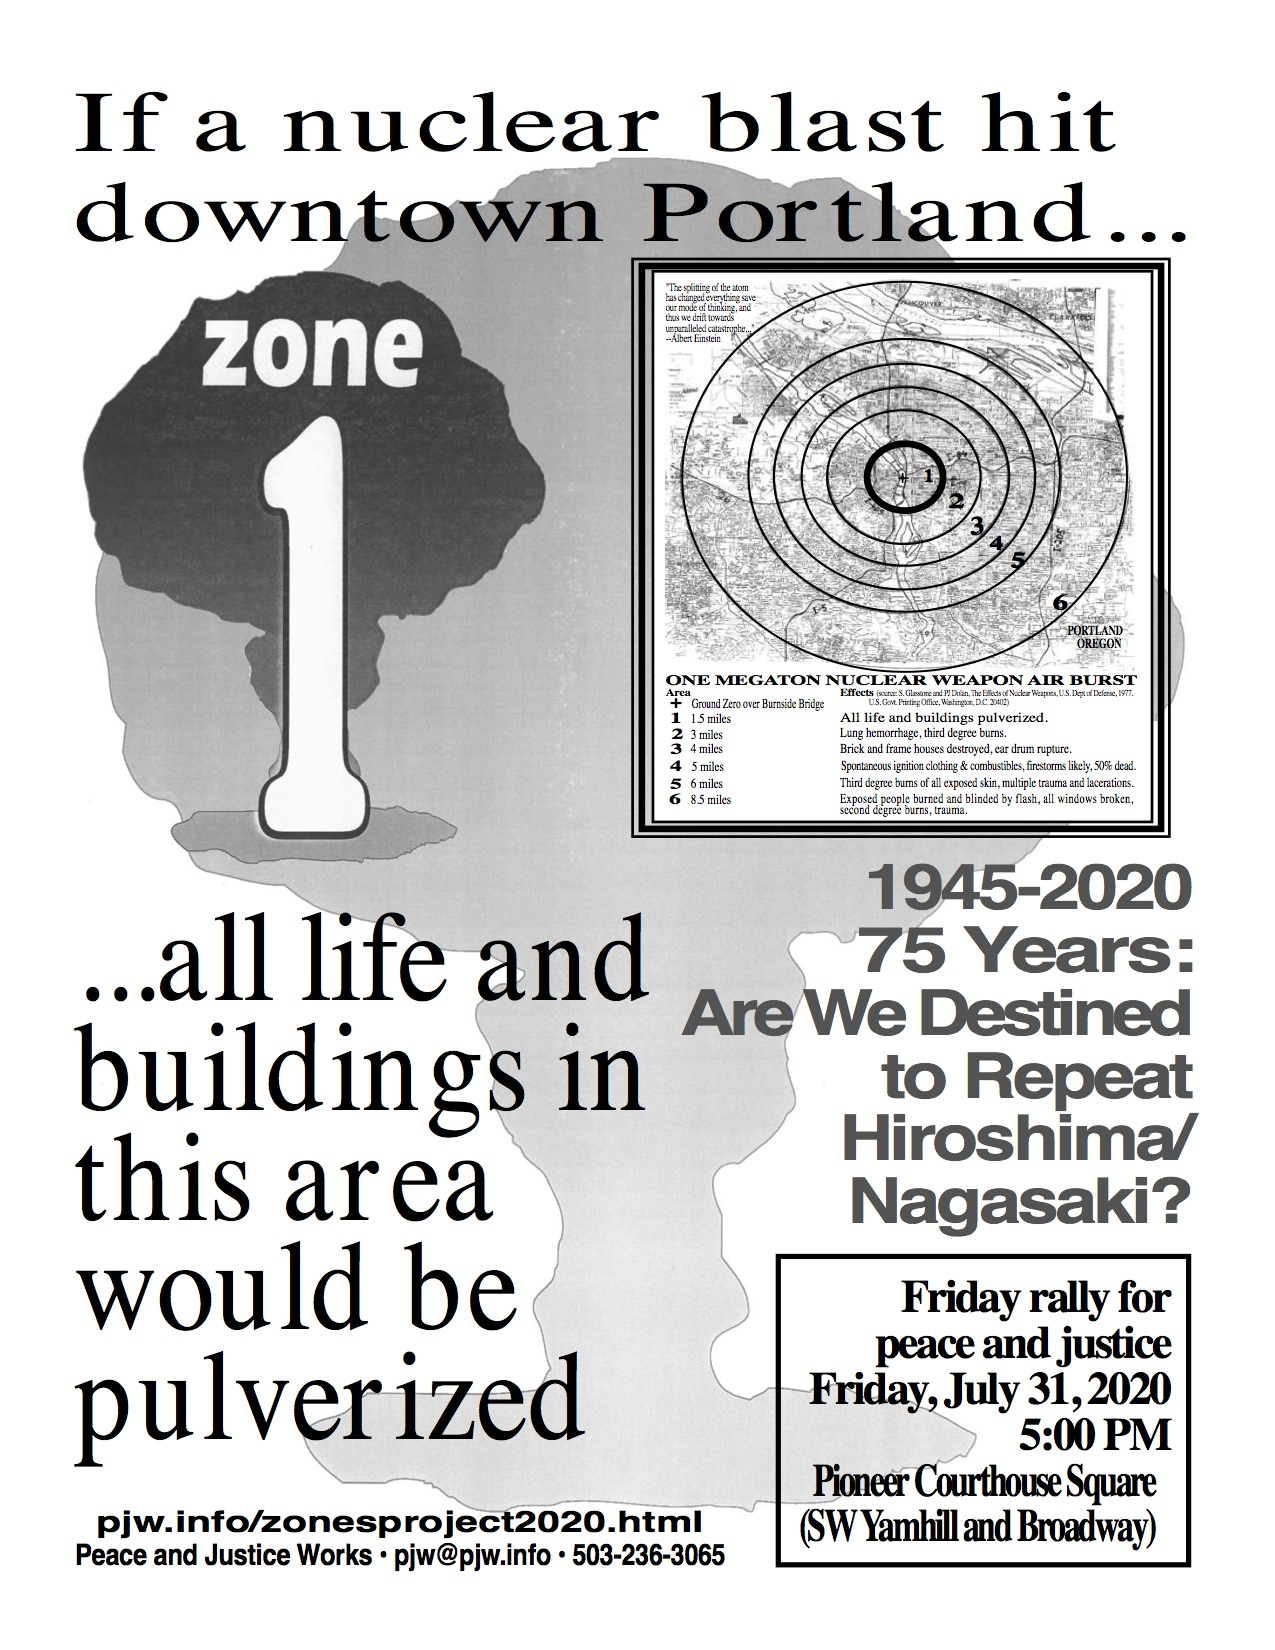 [Hiroshima 75 Years Later flyer]